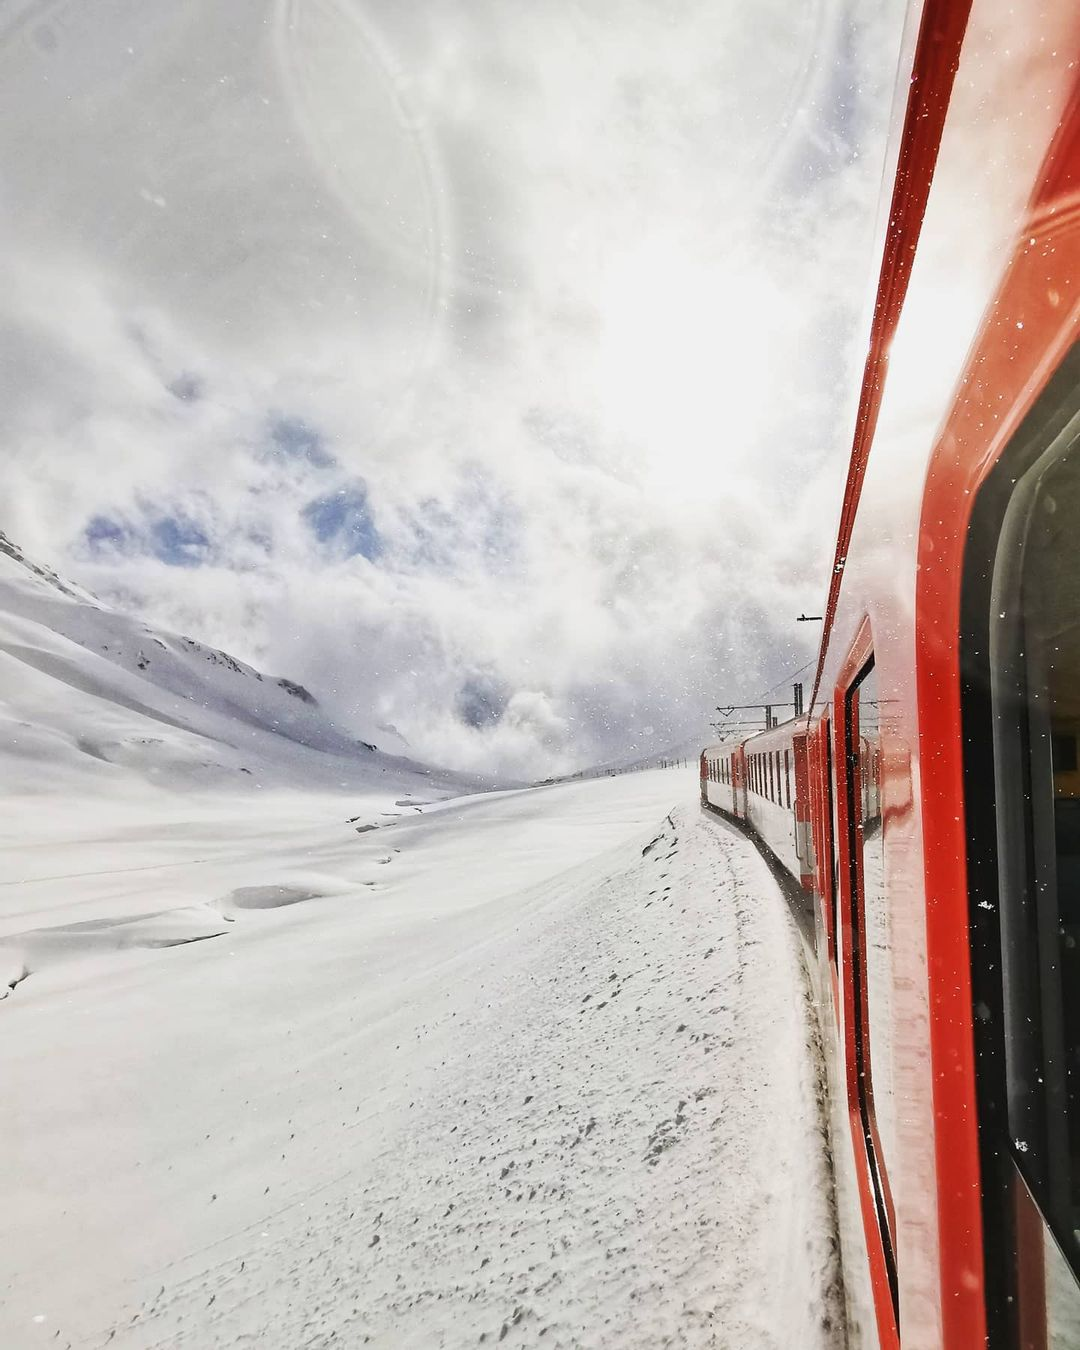 Glacier Express viajes en tren